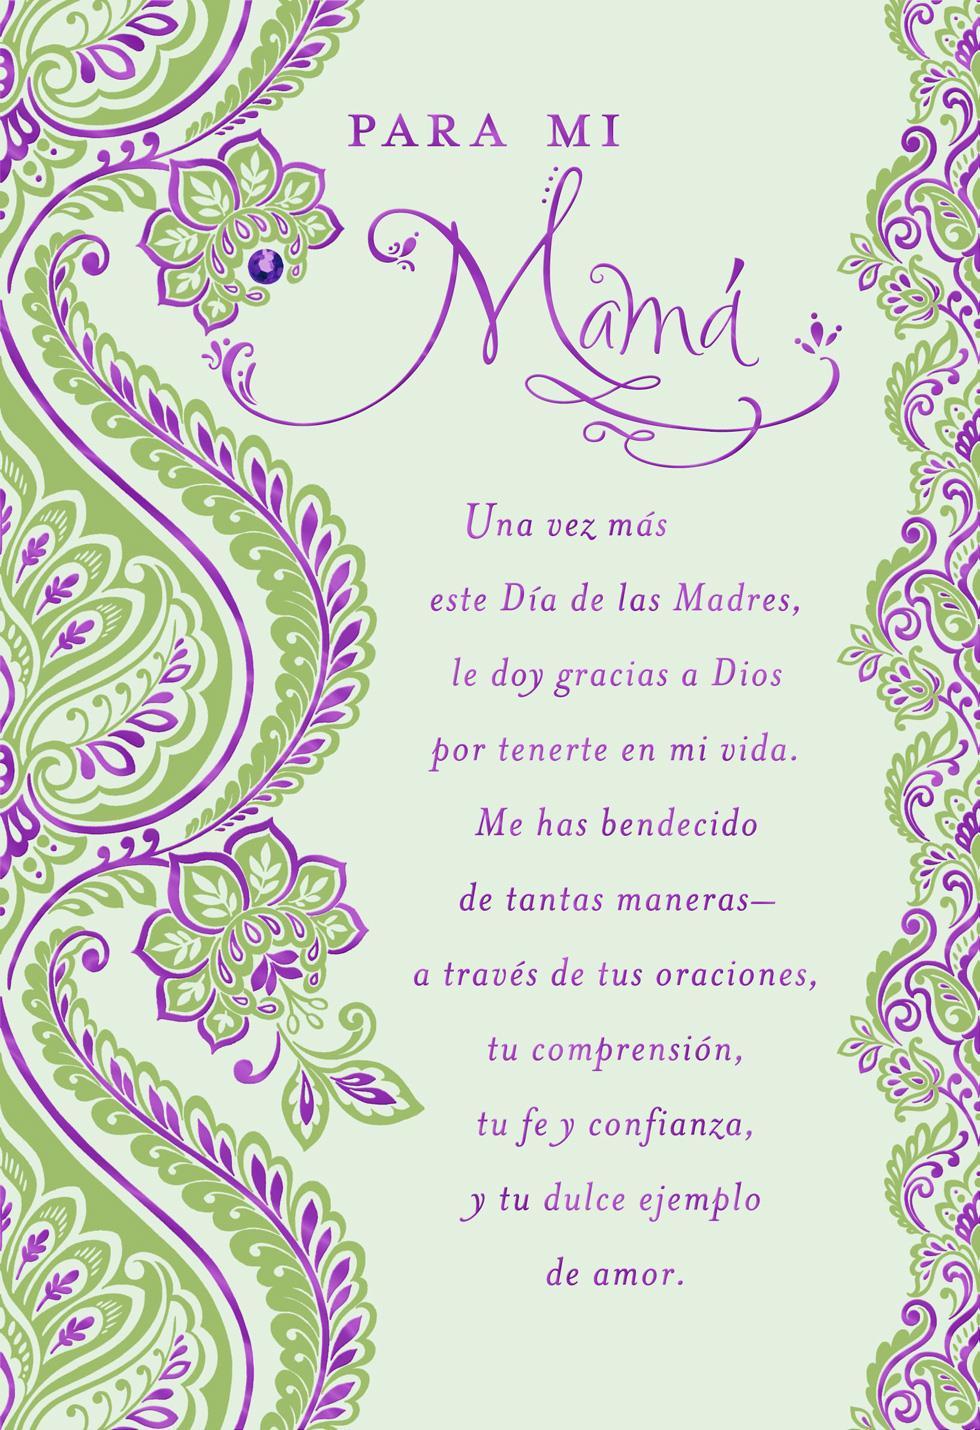 Paisley Flowers Spanish Language Religious Mothers Day